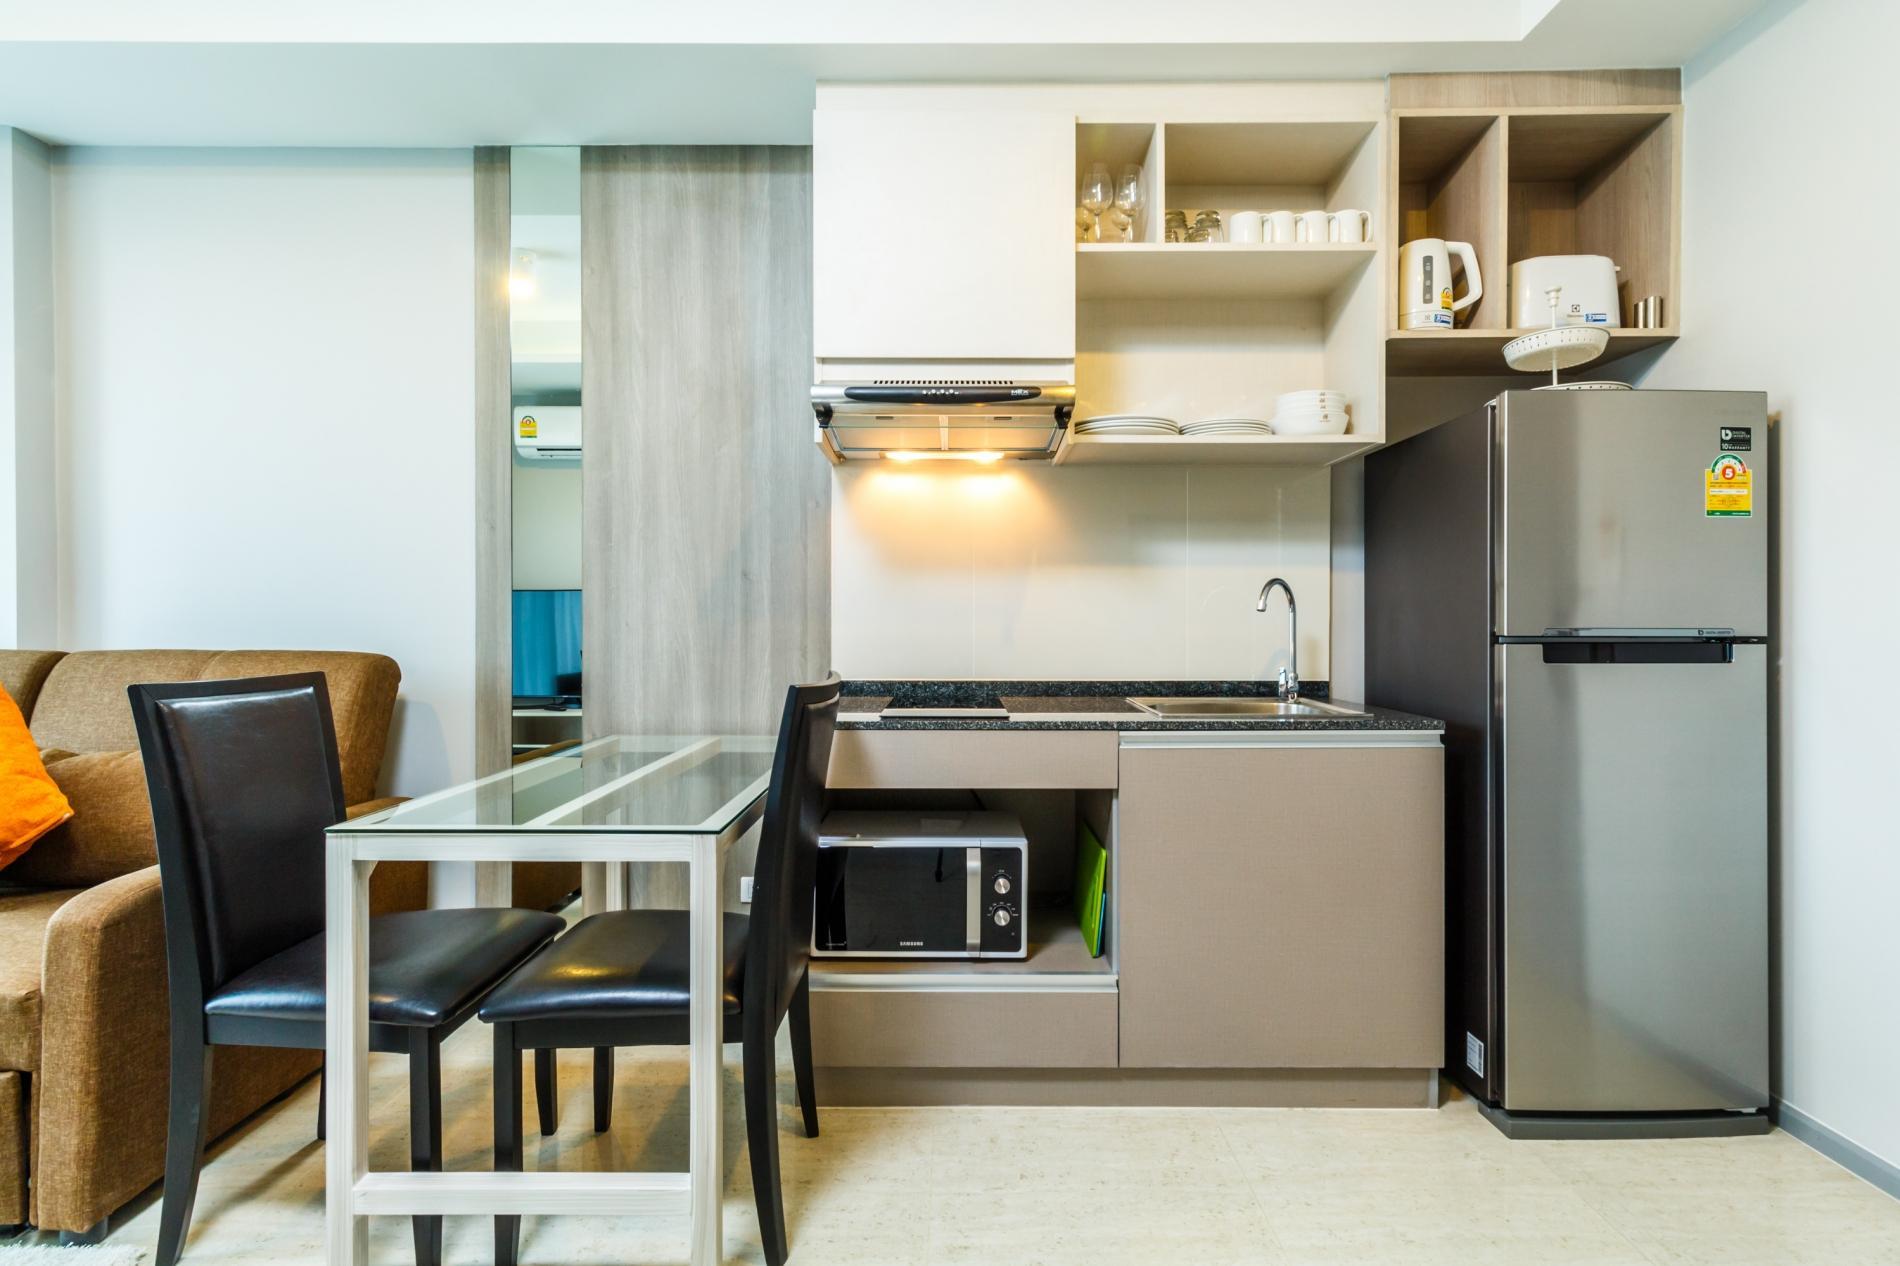 Apartment 6Av 703 - Large apartment in Surin beach photo 20396161